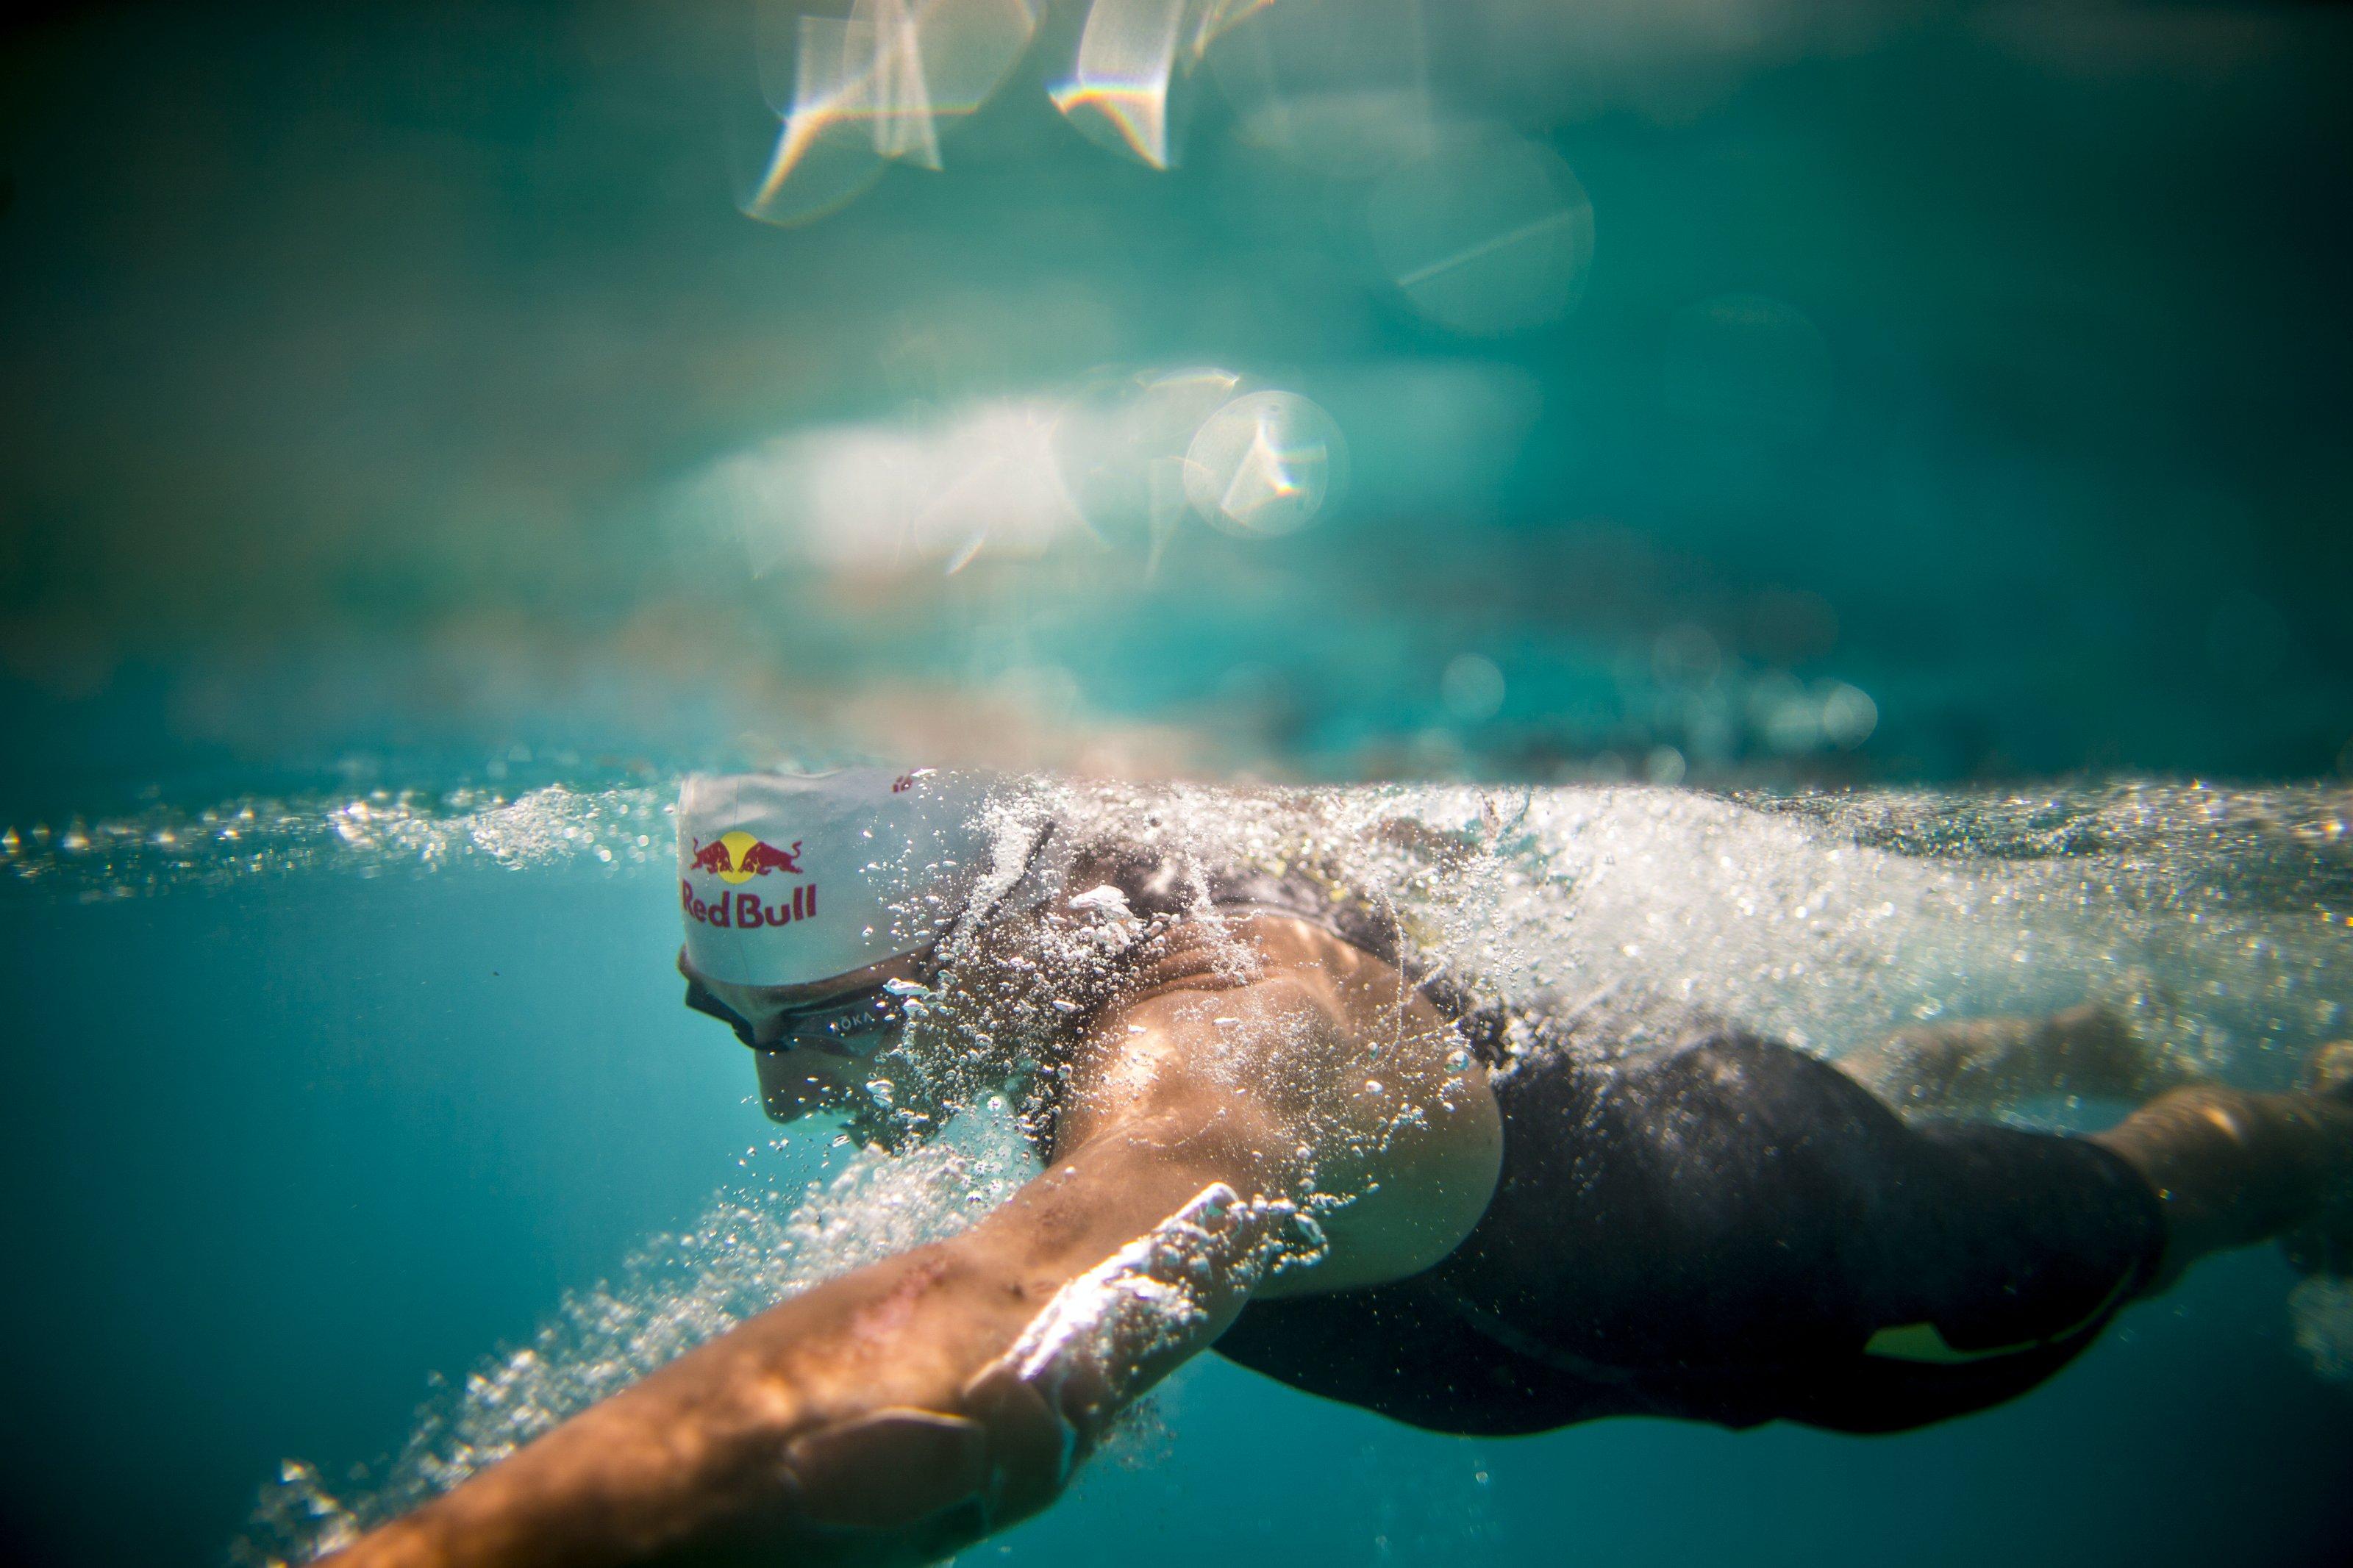 Jesse Thomas podczas treningu. Foto: Zak Noyle/Red Bull Content Pool